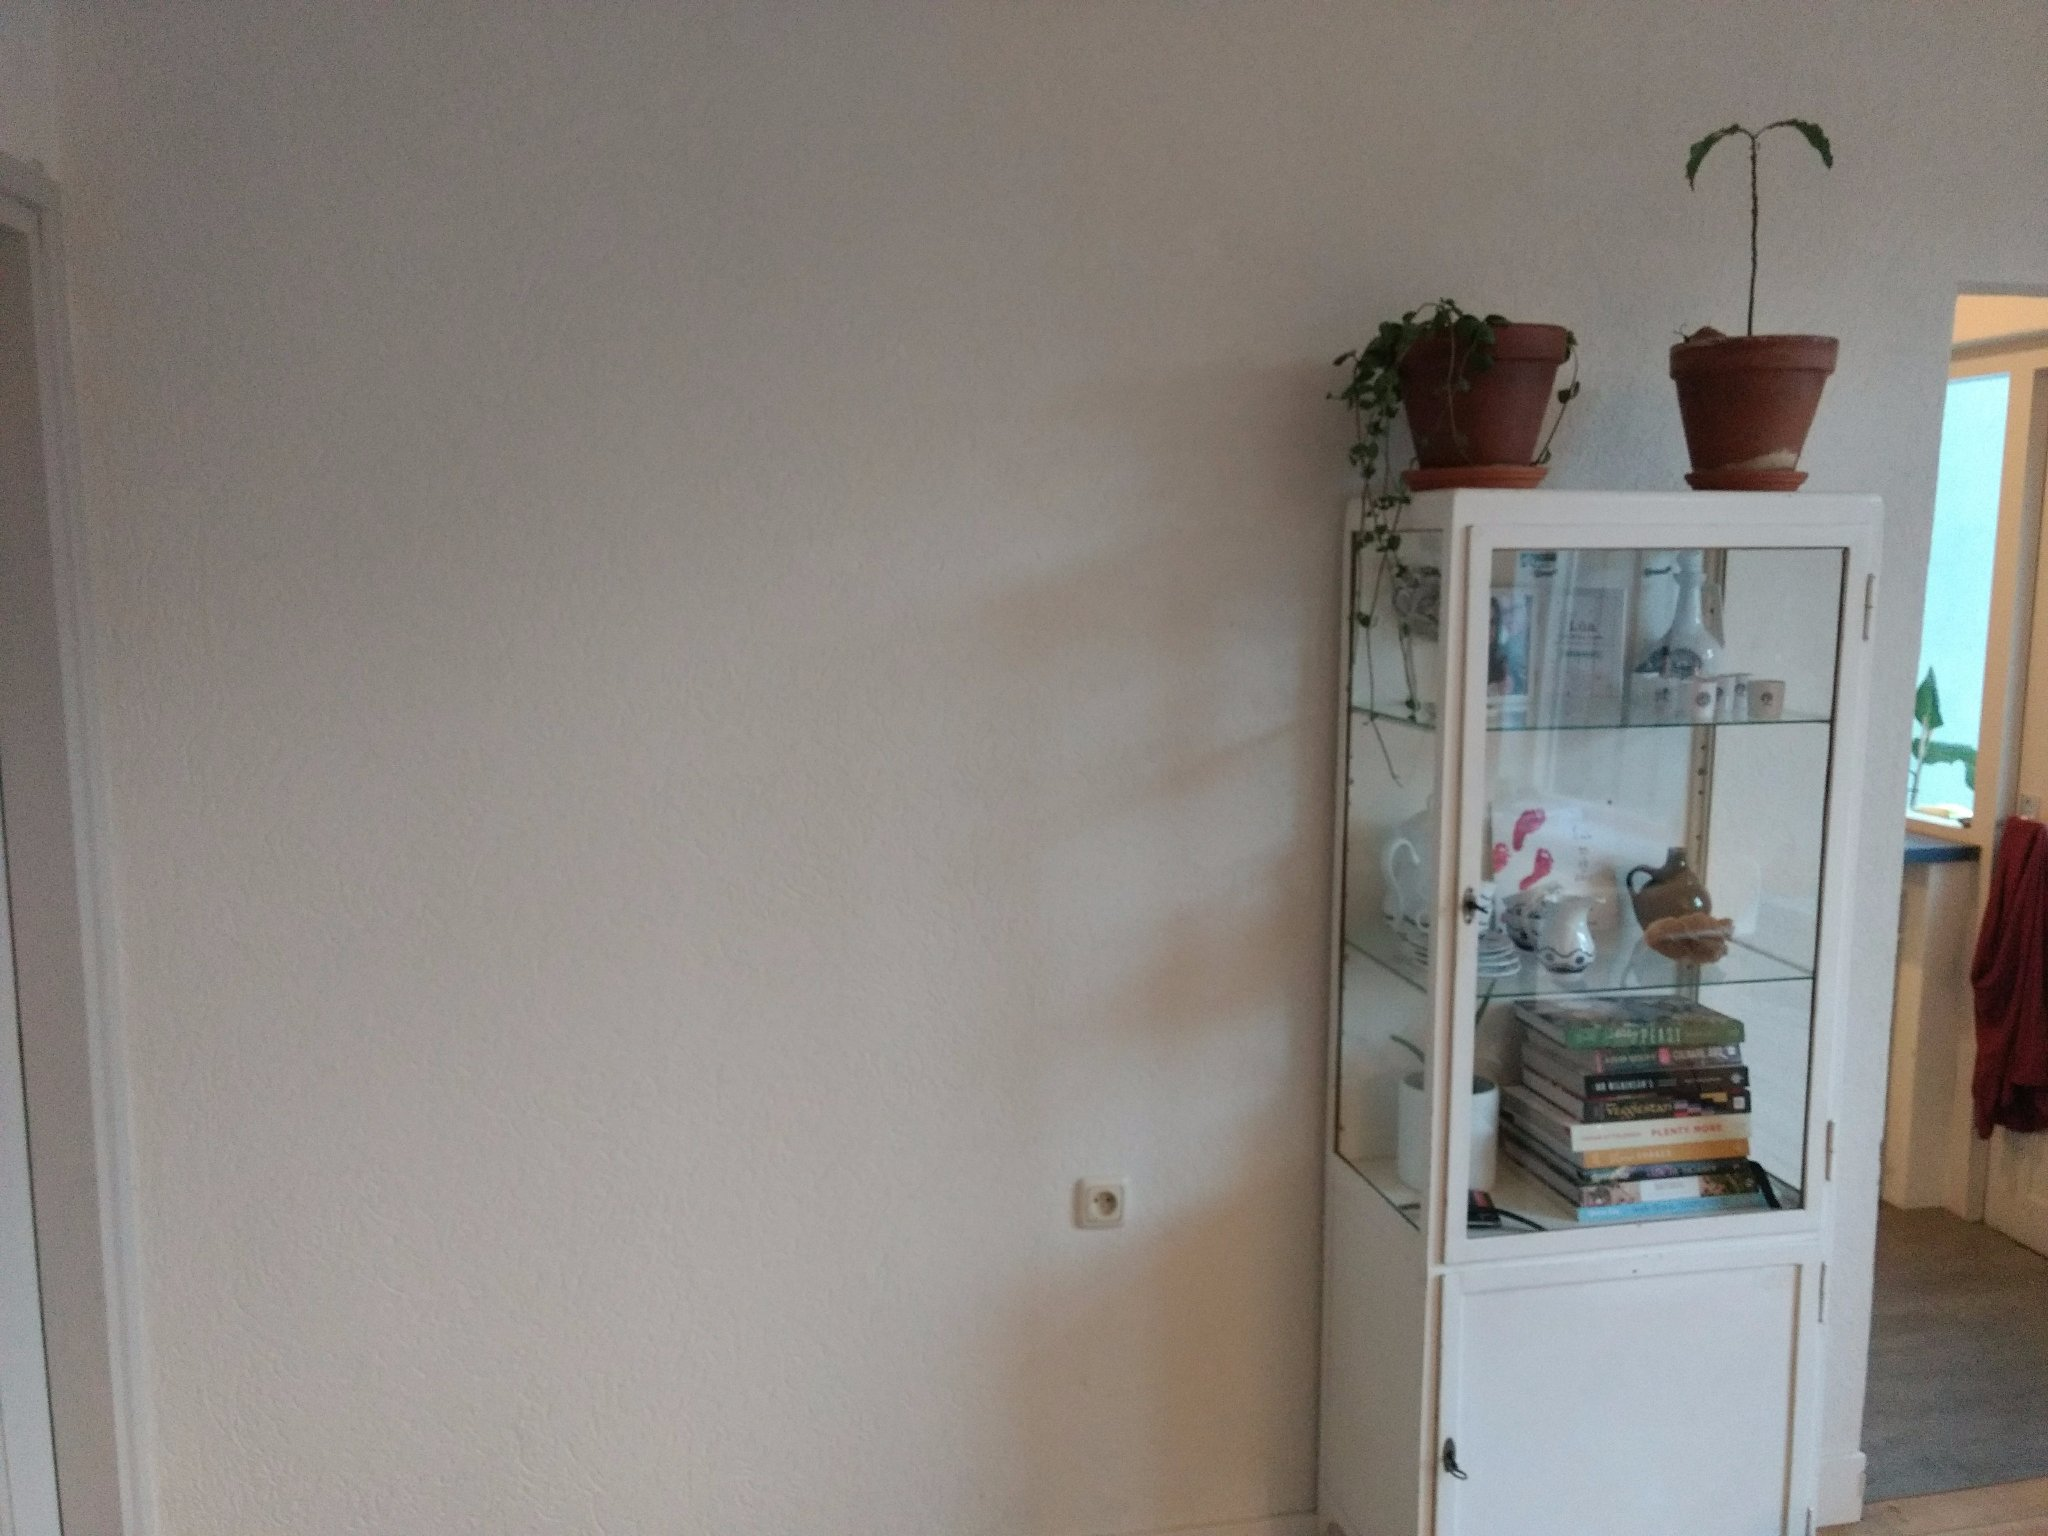 Keuken serre serre betrekken bij woonkamer en dak